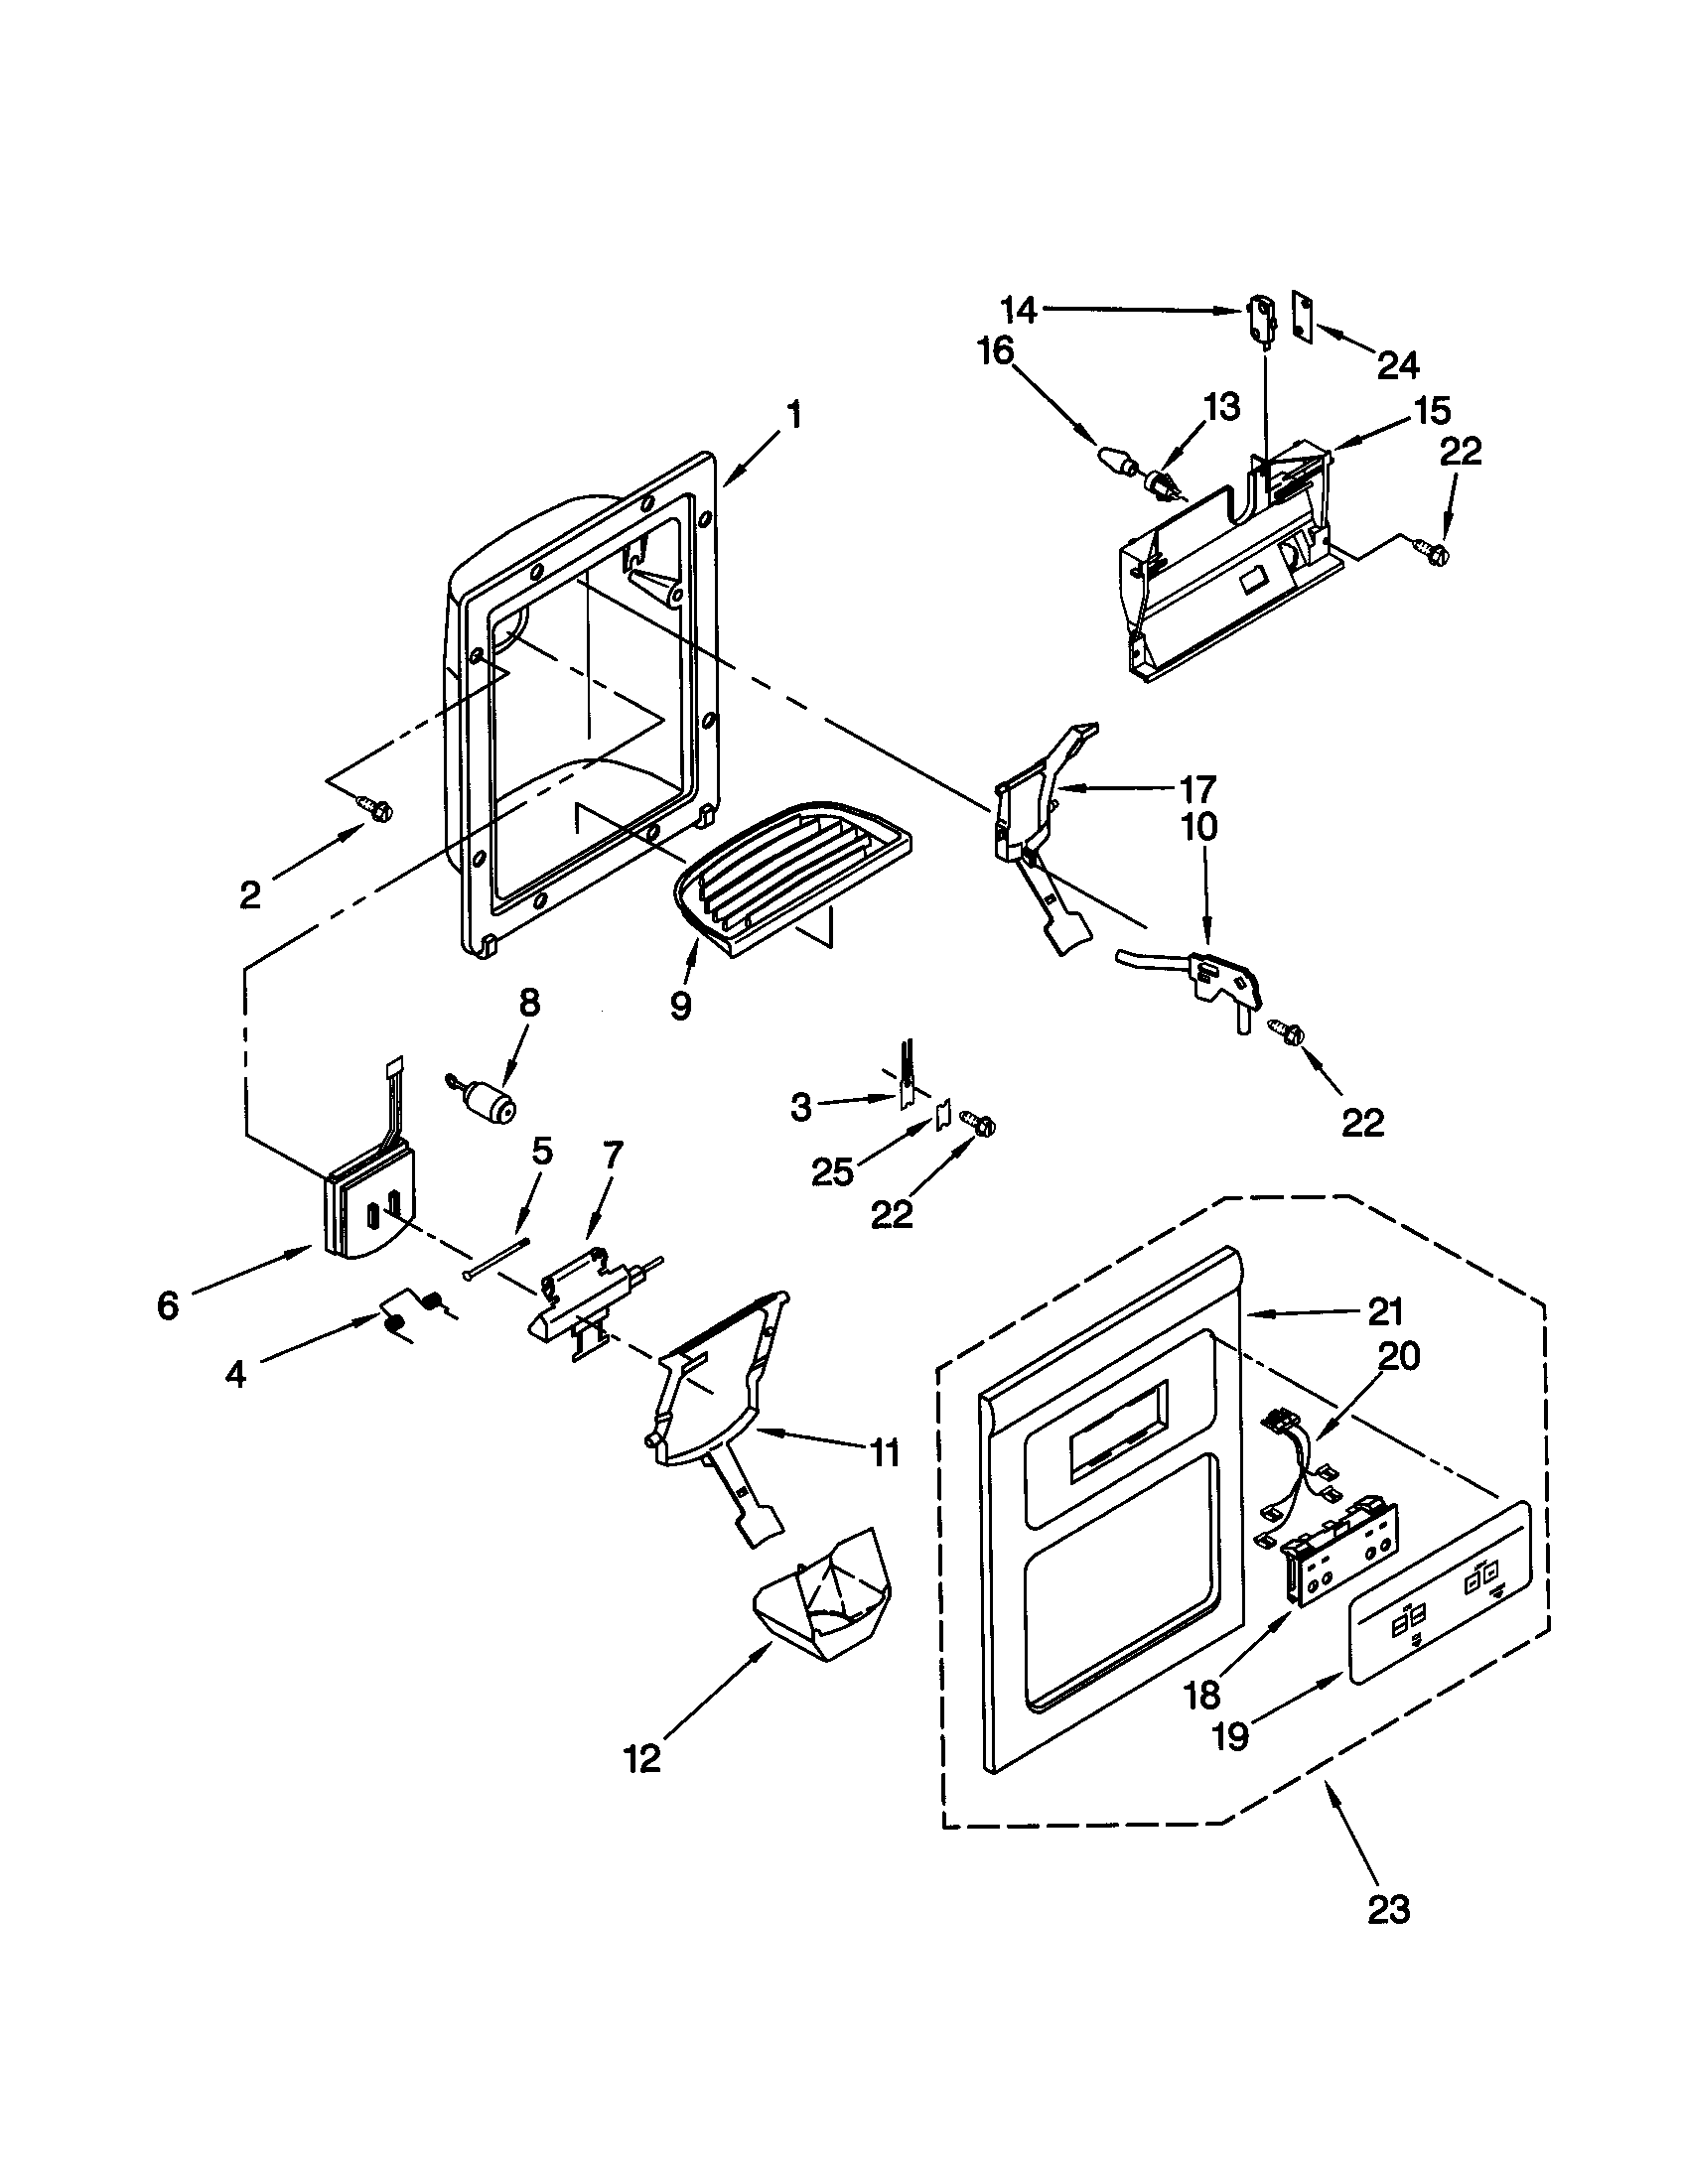 kenmore 106 refrigerator parts diagram set up croquet court coldspot model wiring